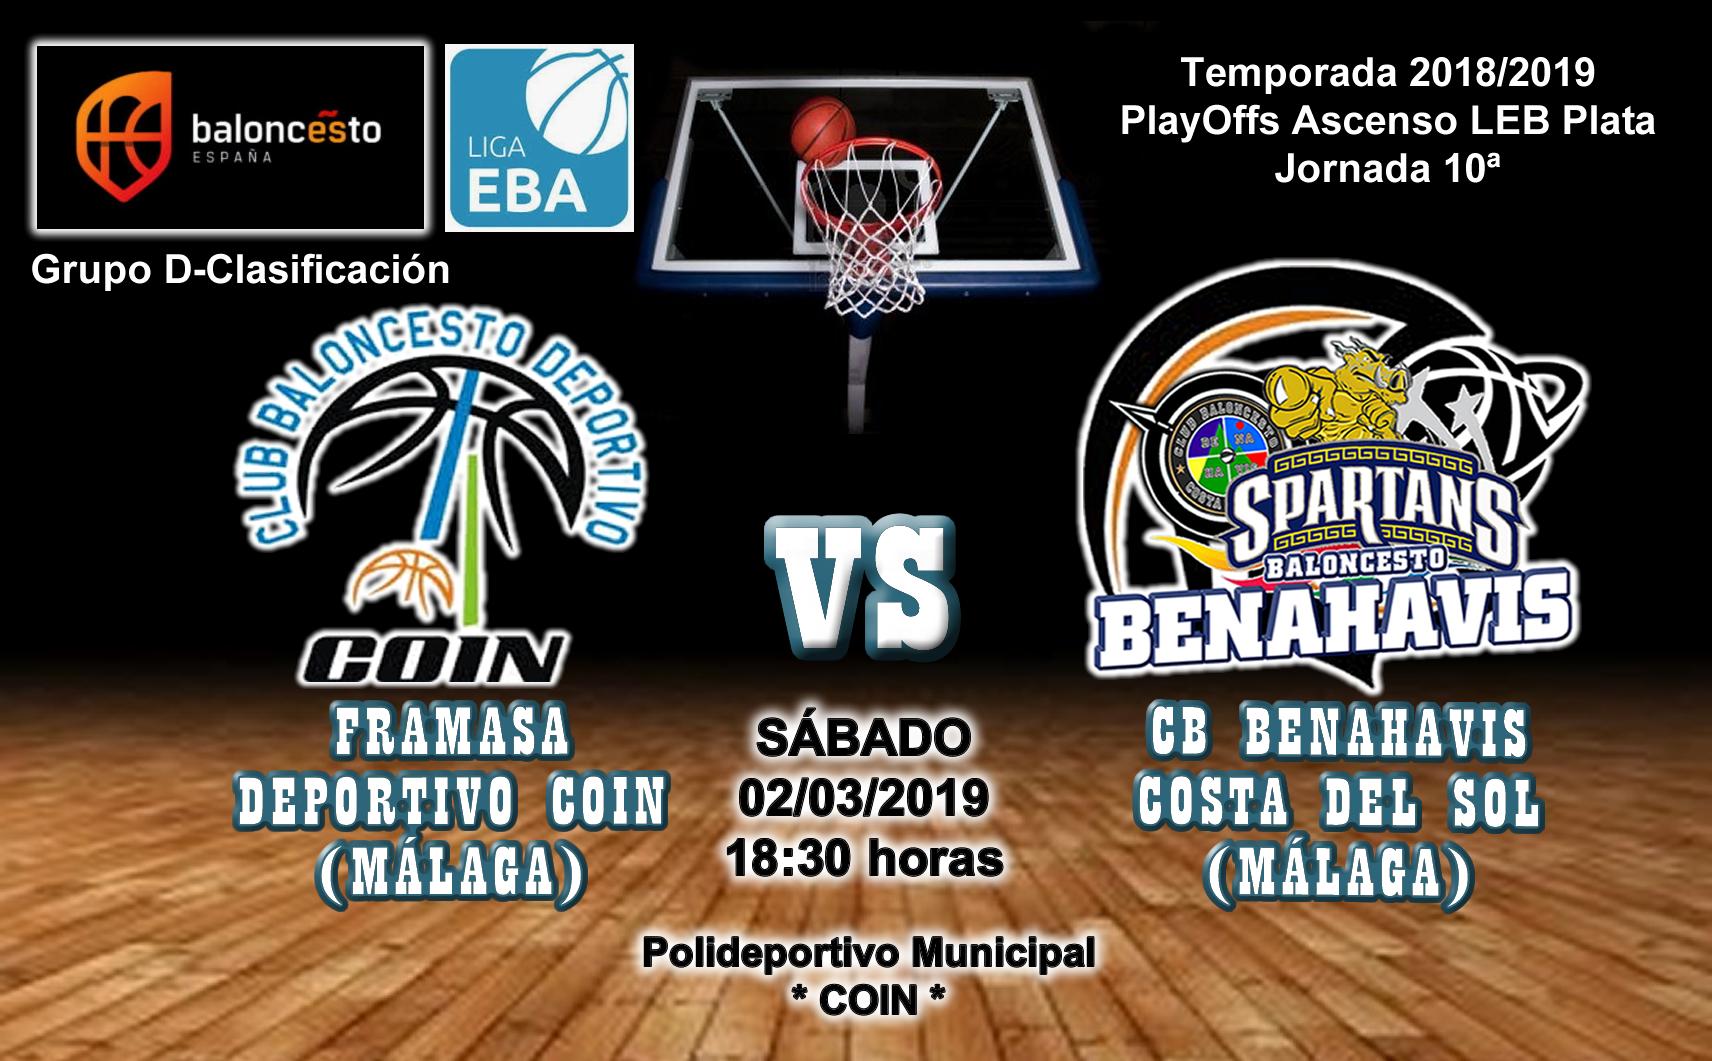 PREVIA EBA D 18/19> PlayOffs Ascenso Leb Plata   J-10ª > Framasa Deportivo Coin vs CB Benahavís Costa del Sol